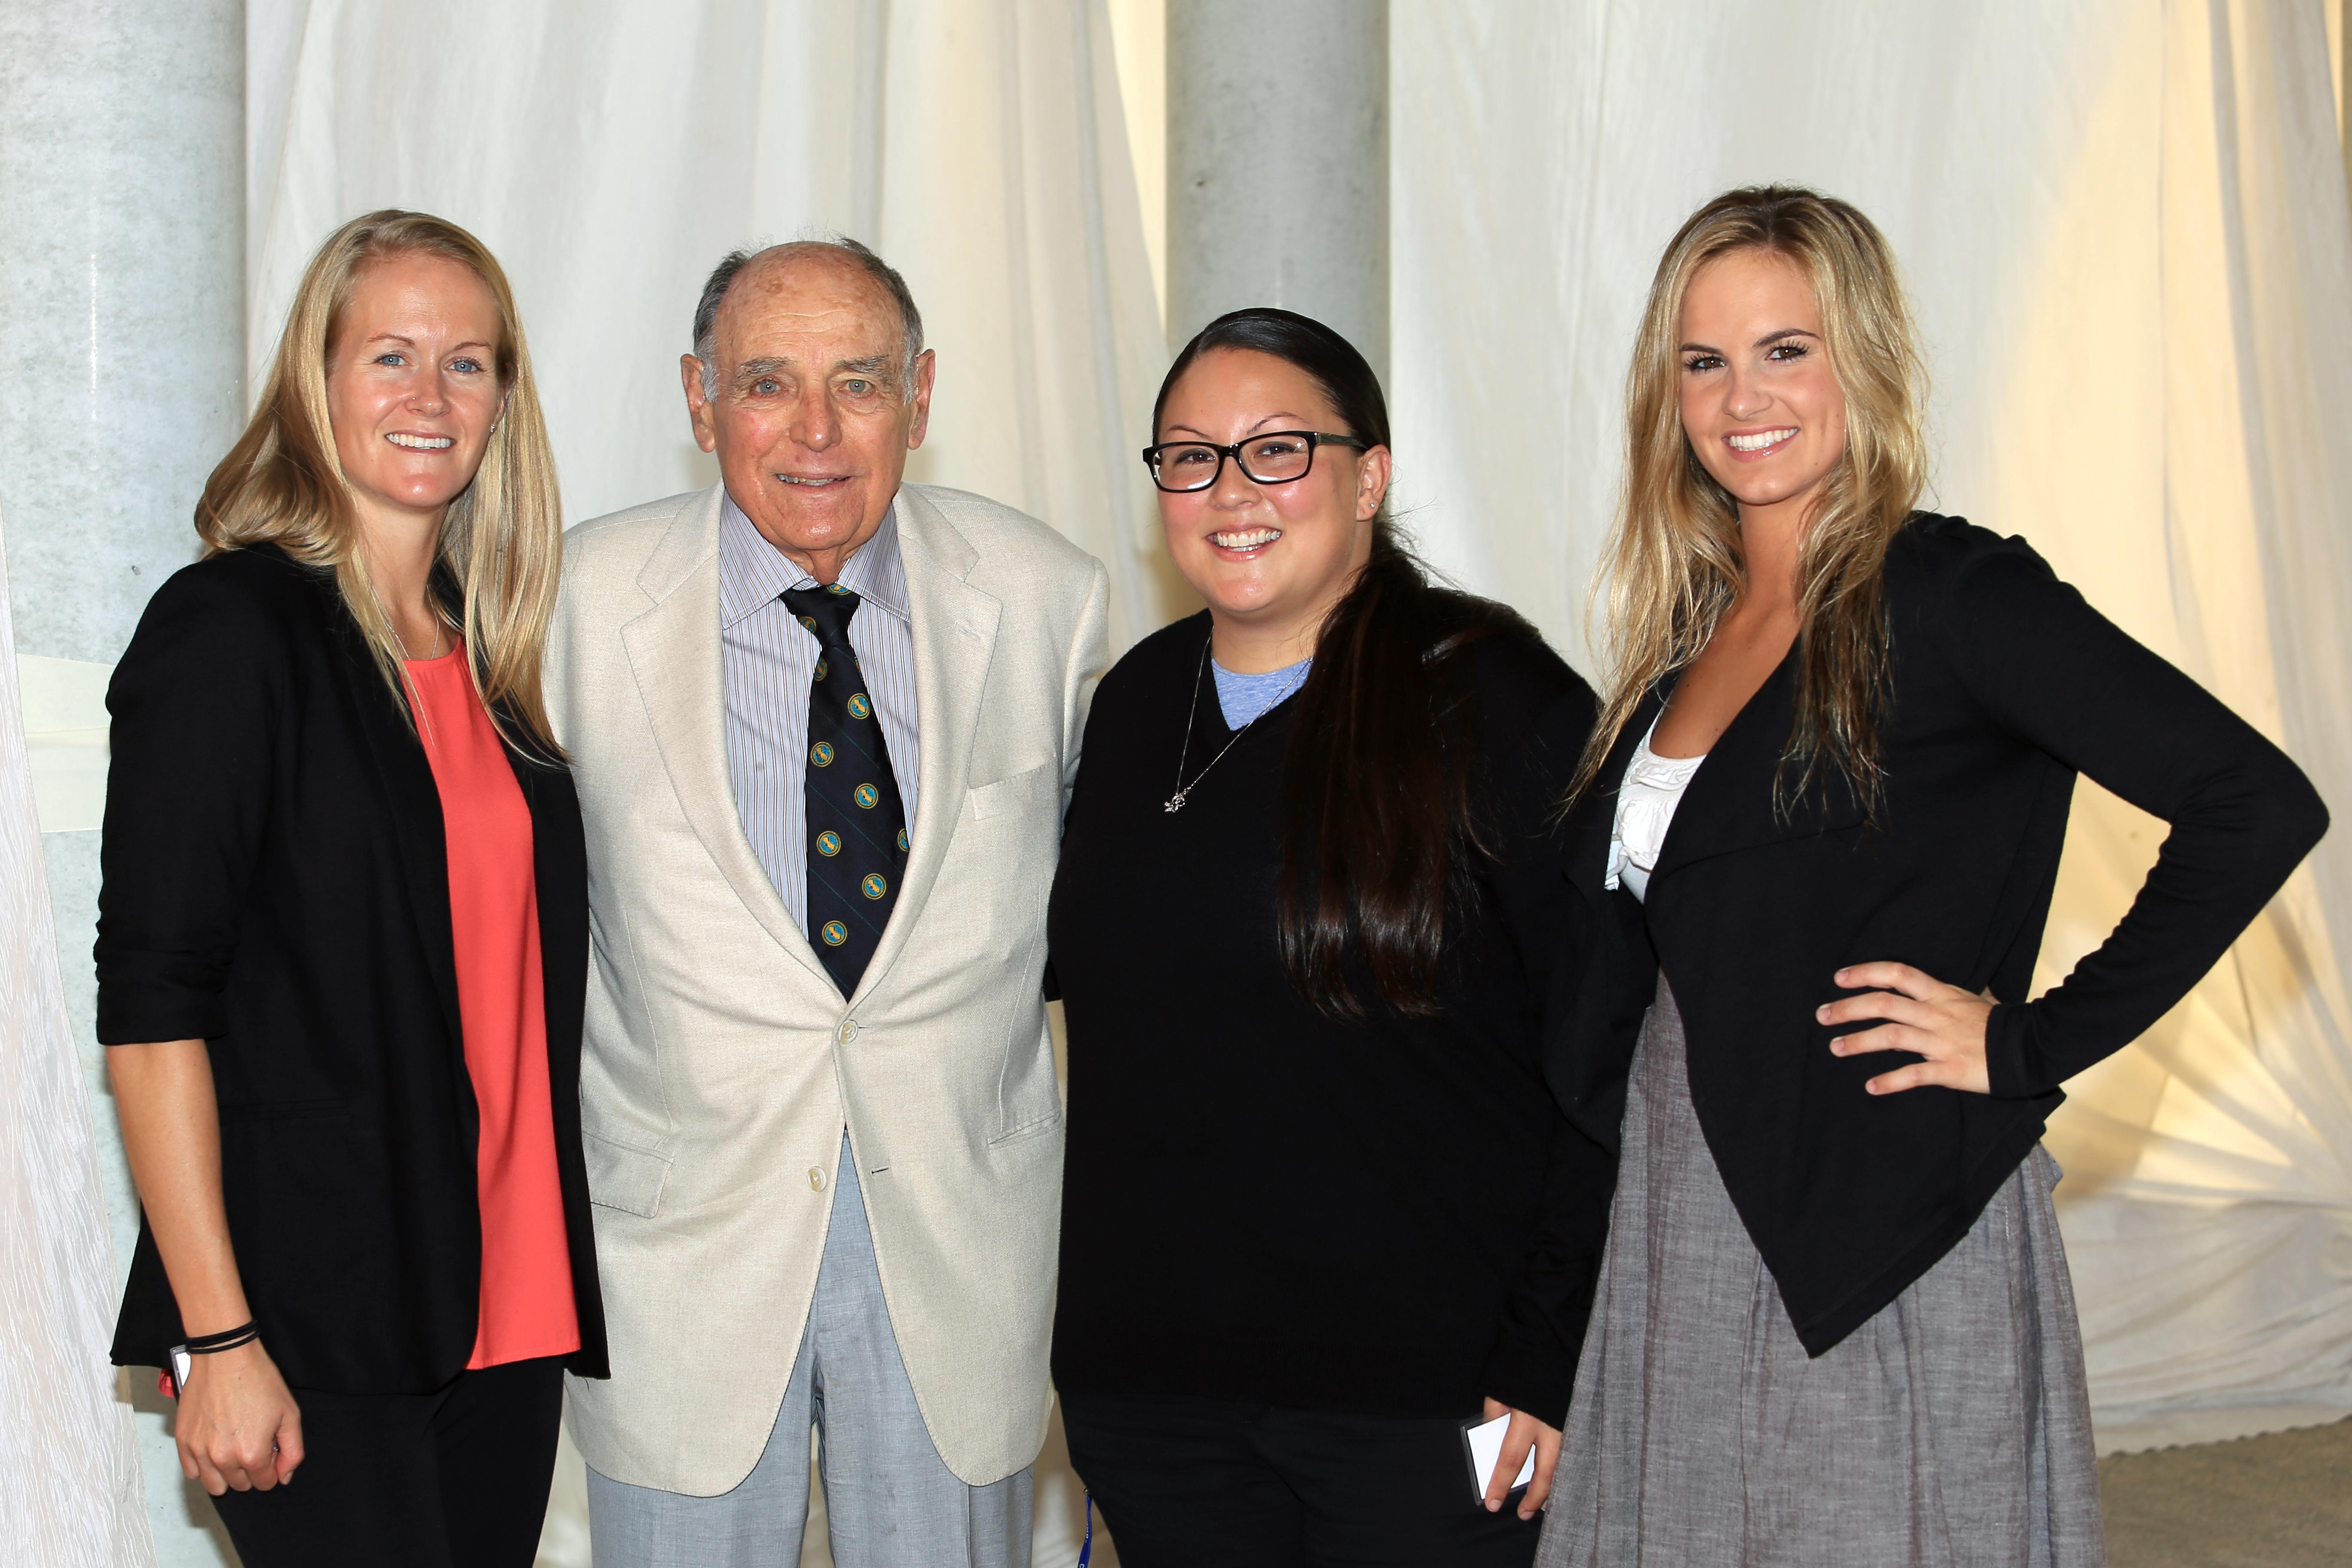 Bob Johnson and his daughters